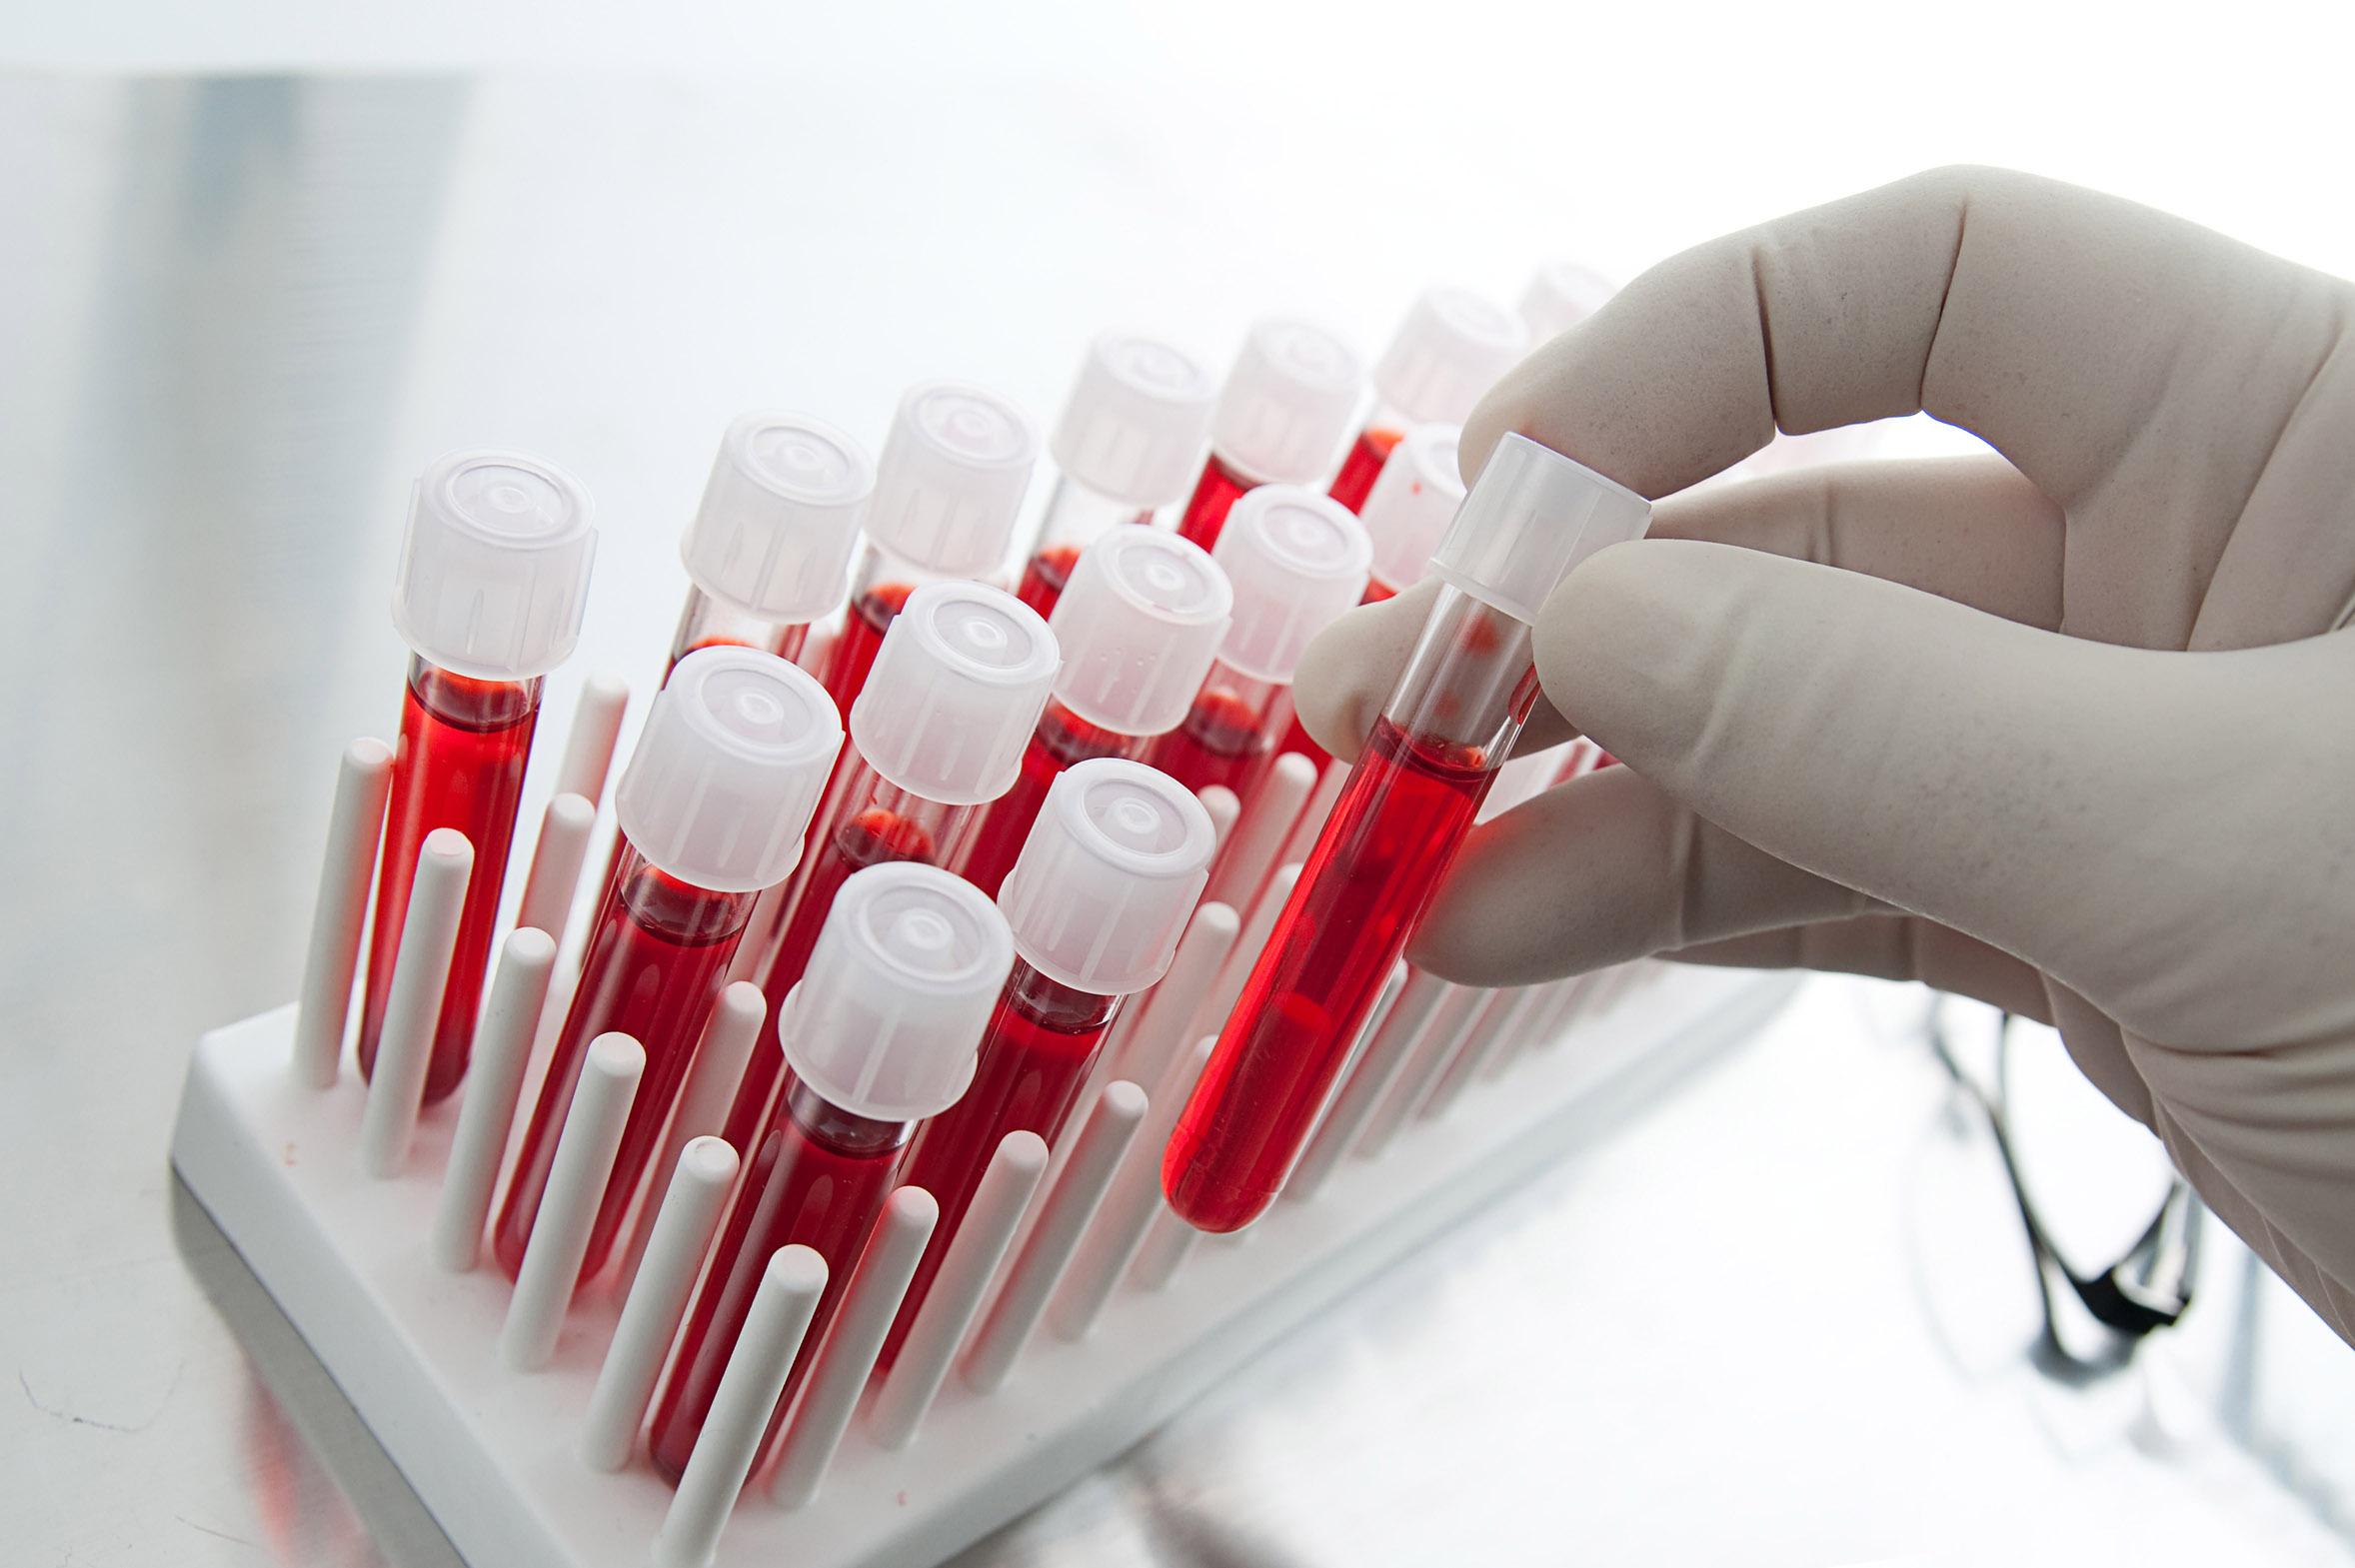 PSA Testi ile Prostat Kanserinde Erken Teşhis